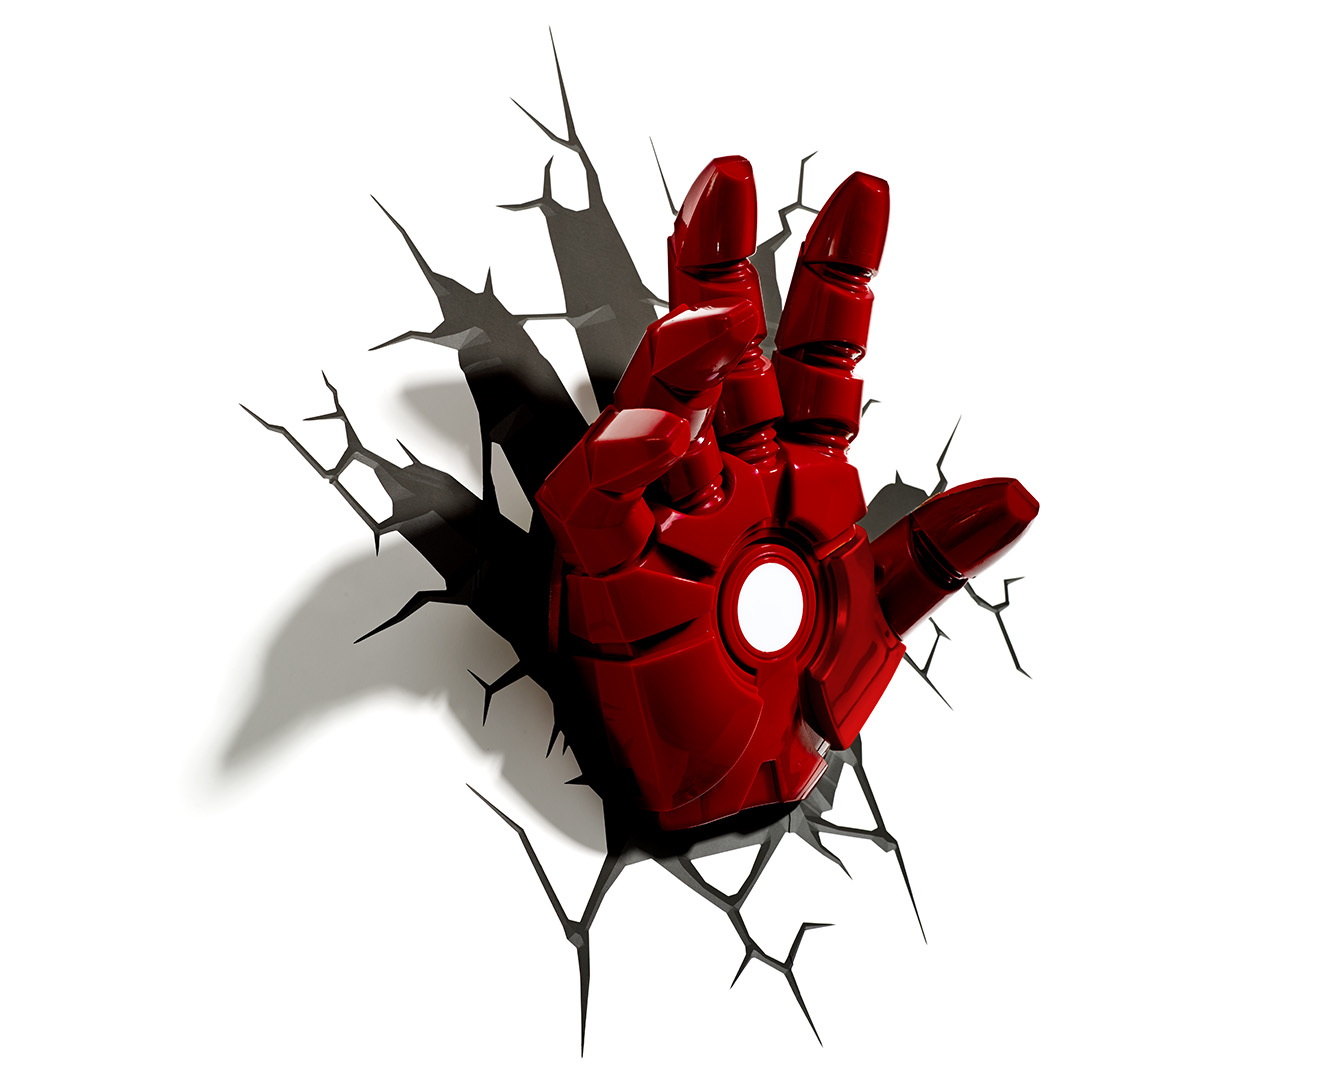 Wall Light Iron Man : 3D Marvel Iron Man Hand Wall Light - Red eBay